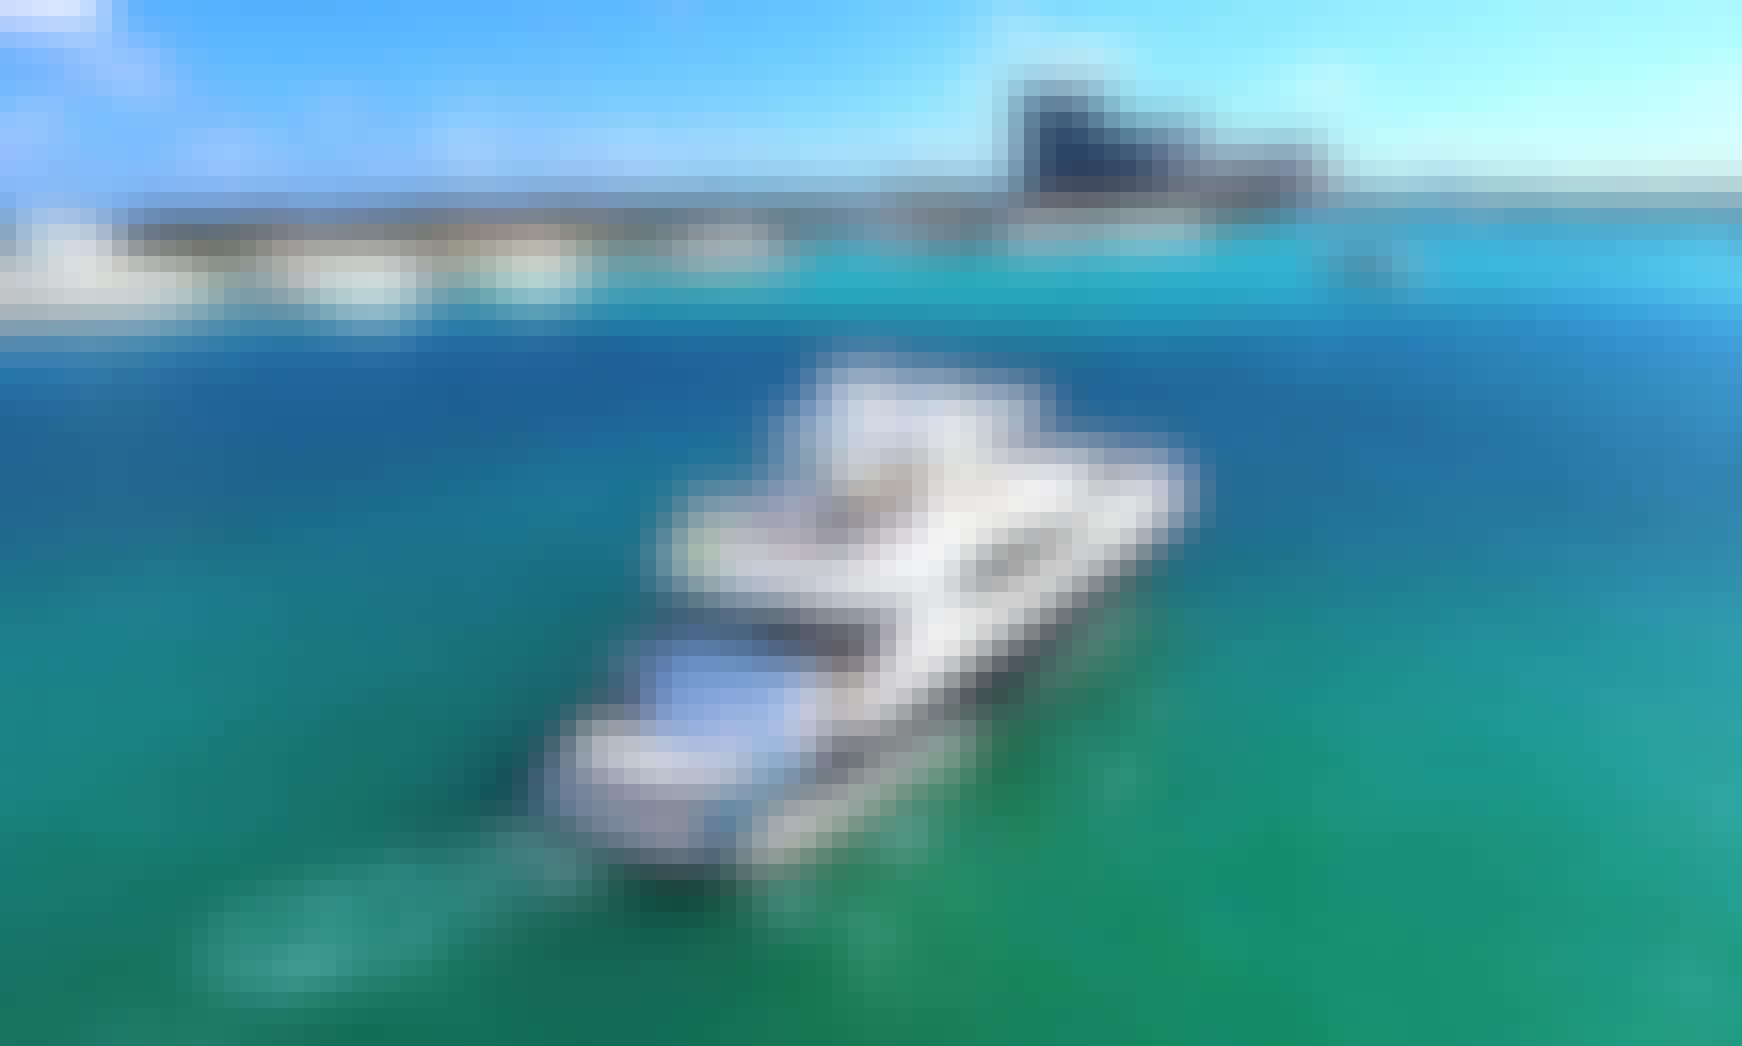 86' Sunseeker Power Mega Yacht Charter in Miami Beach, Florida